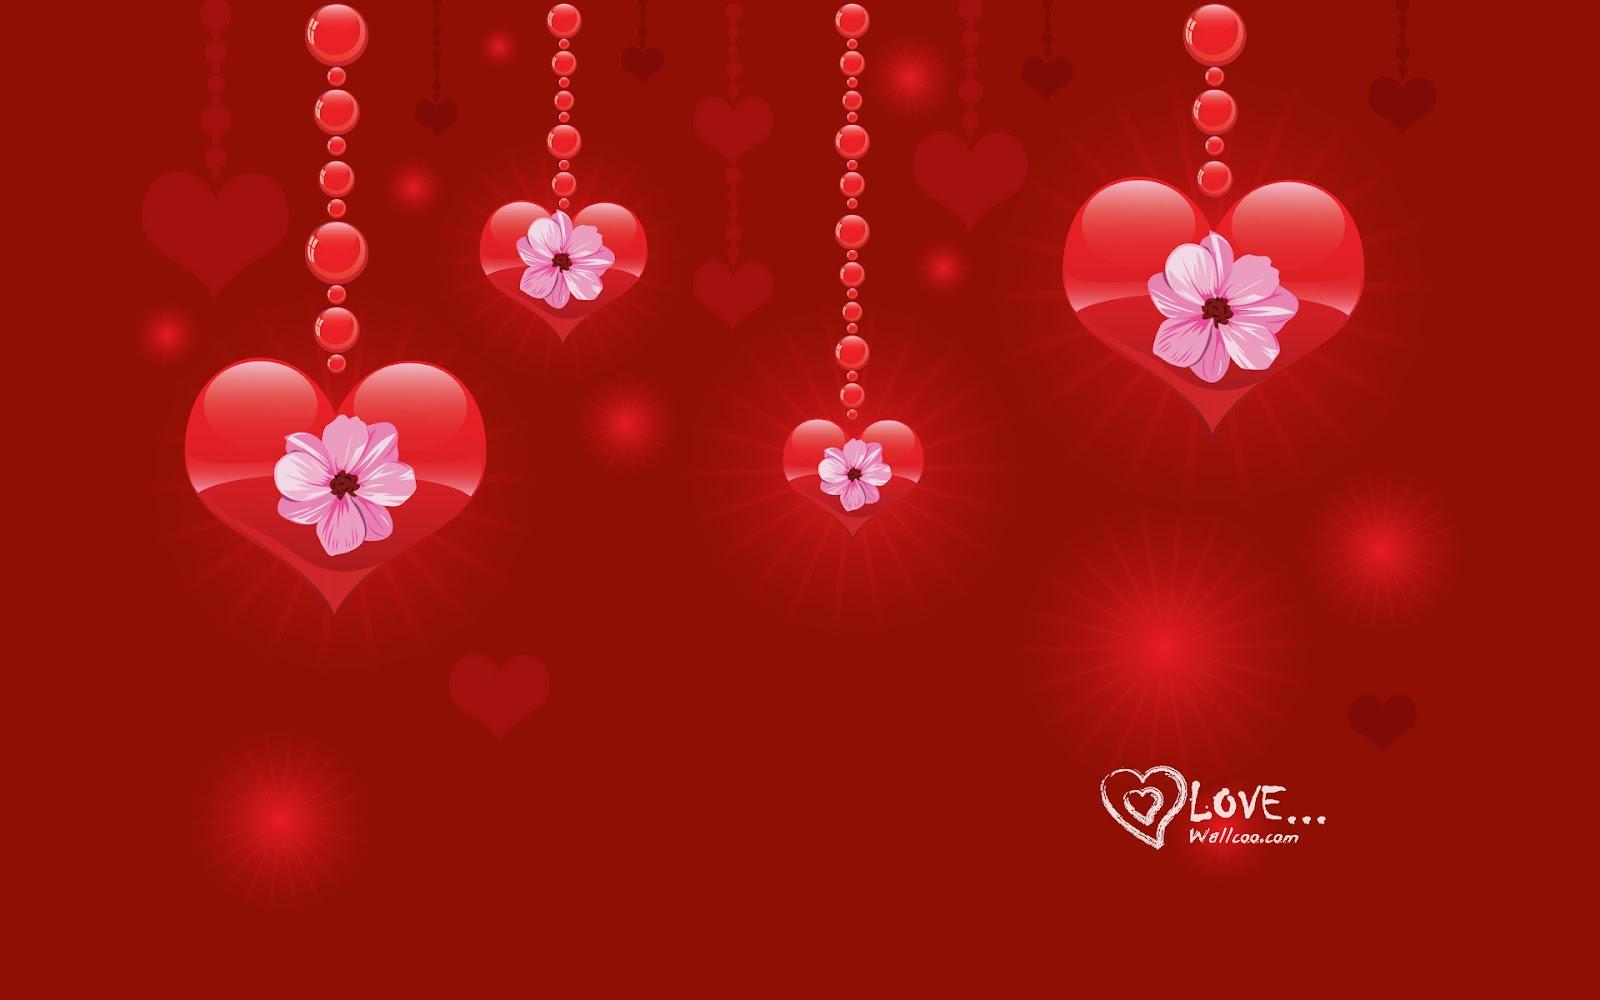 heart wallpapers red heart wallpapers red love heart